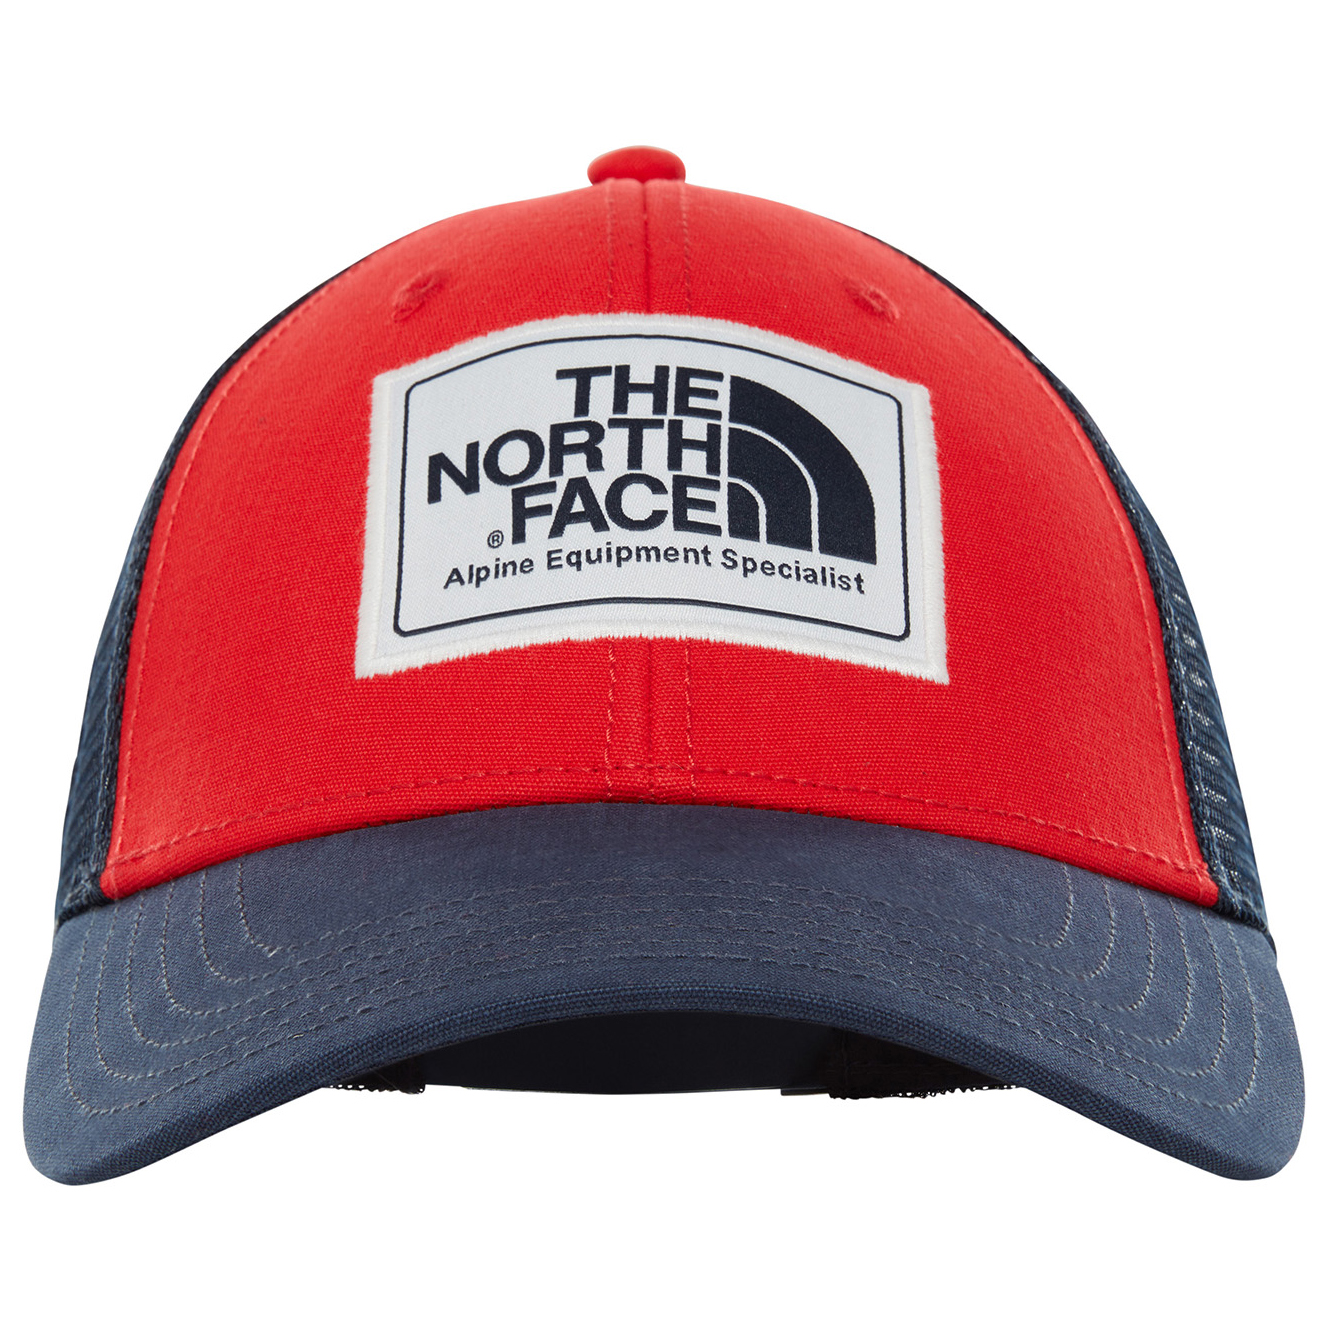 5592f4fb0b The North Face Mudder Trucker Hat - Casquette | Achat en ligne ...